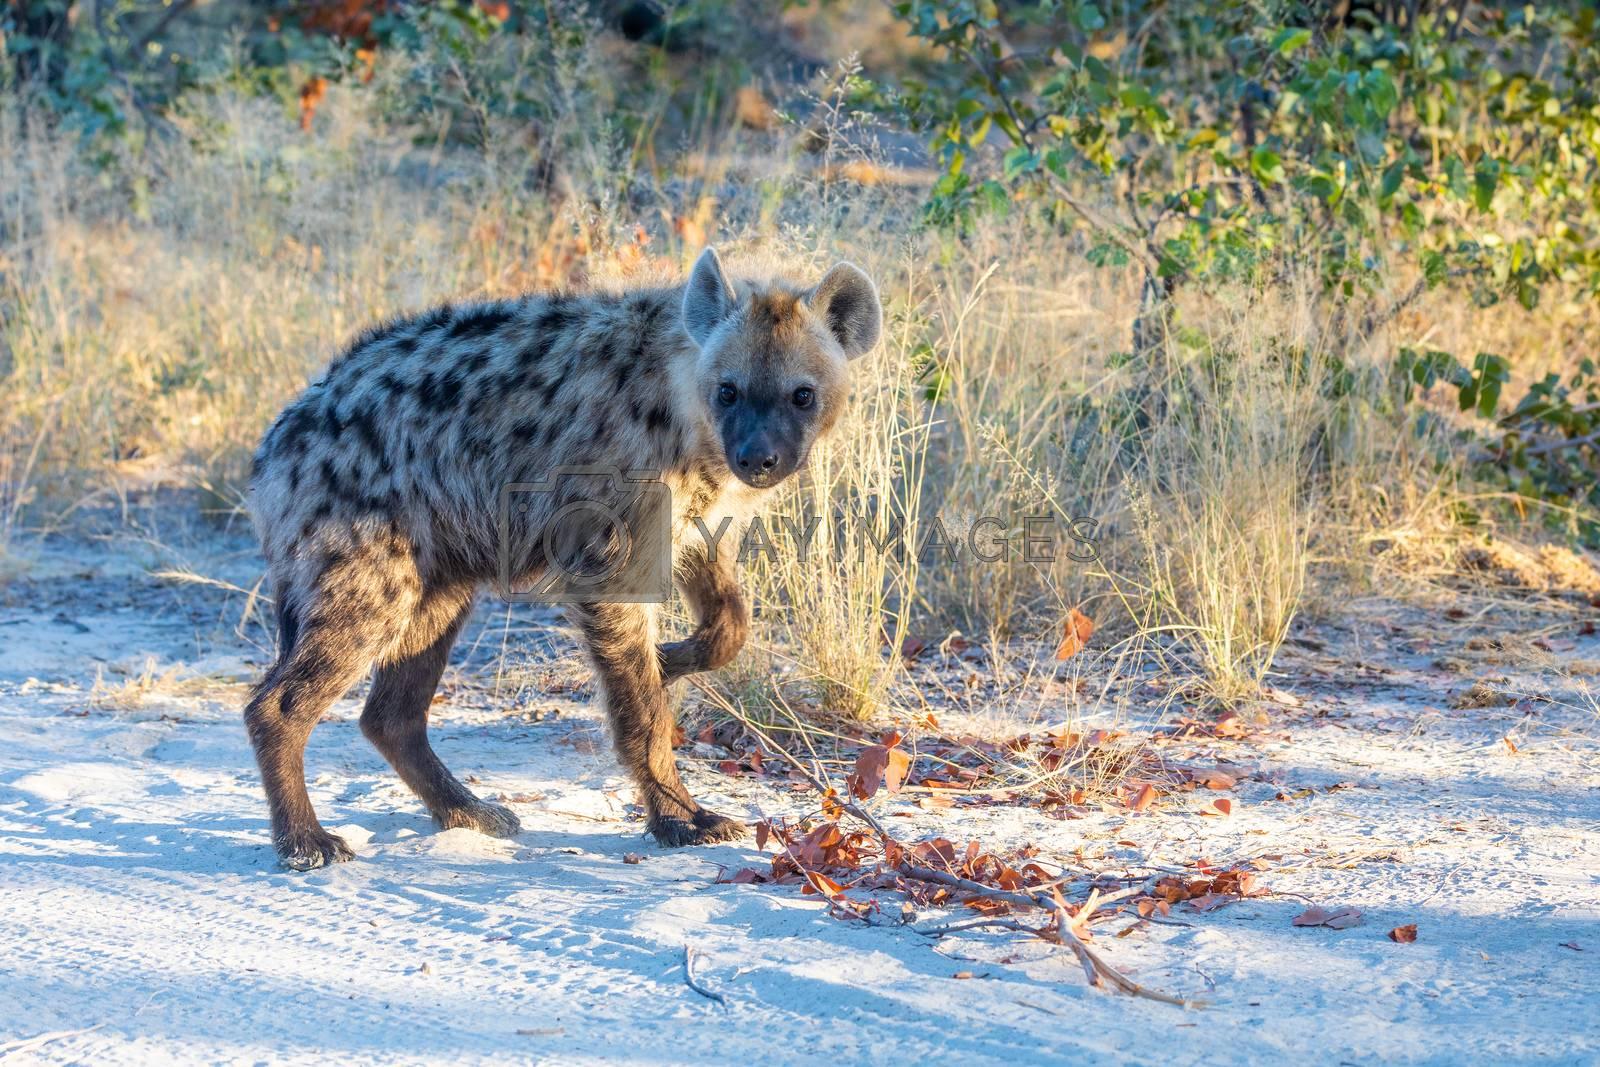 cute baby of Spotted hyena (Hyaena hyaena) in natural habitat moremi game reserve. Botswana Africa safari wildlife